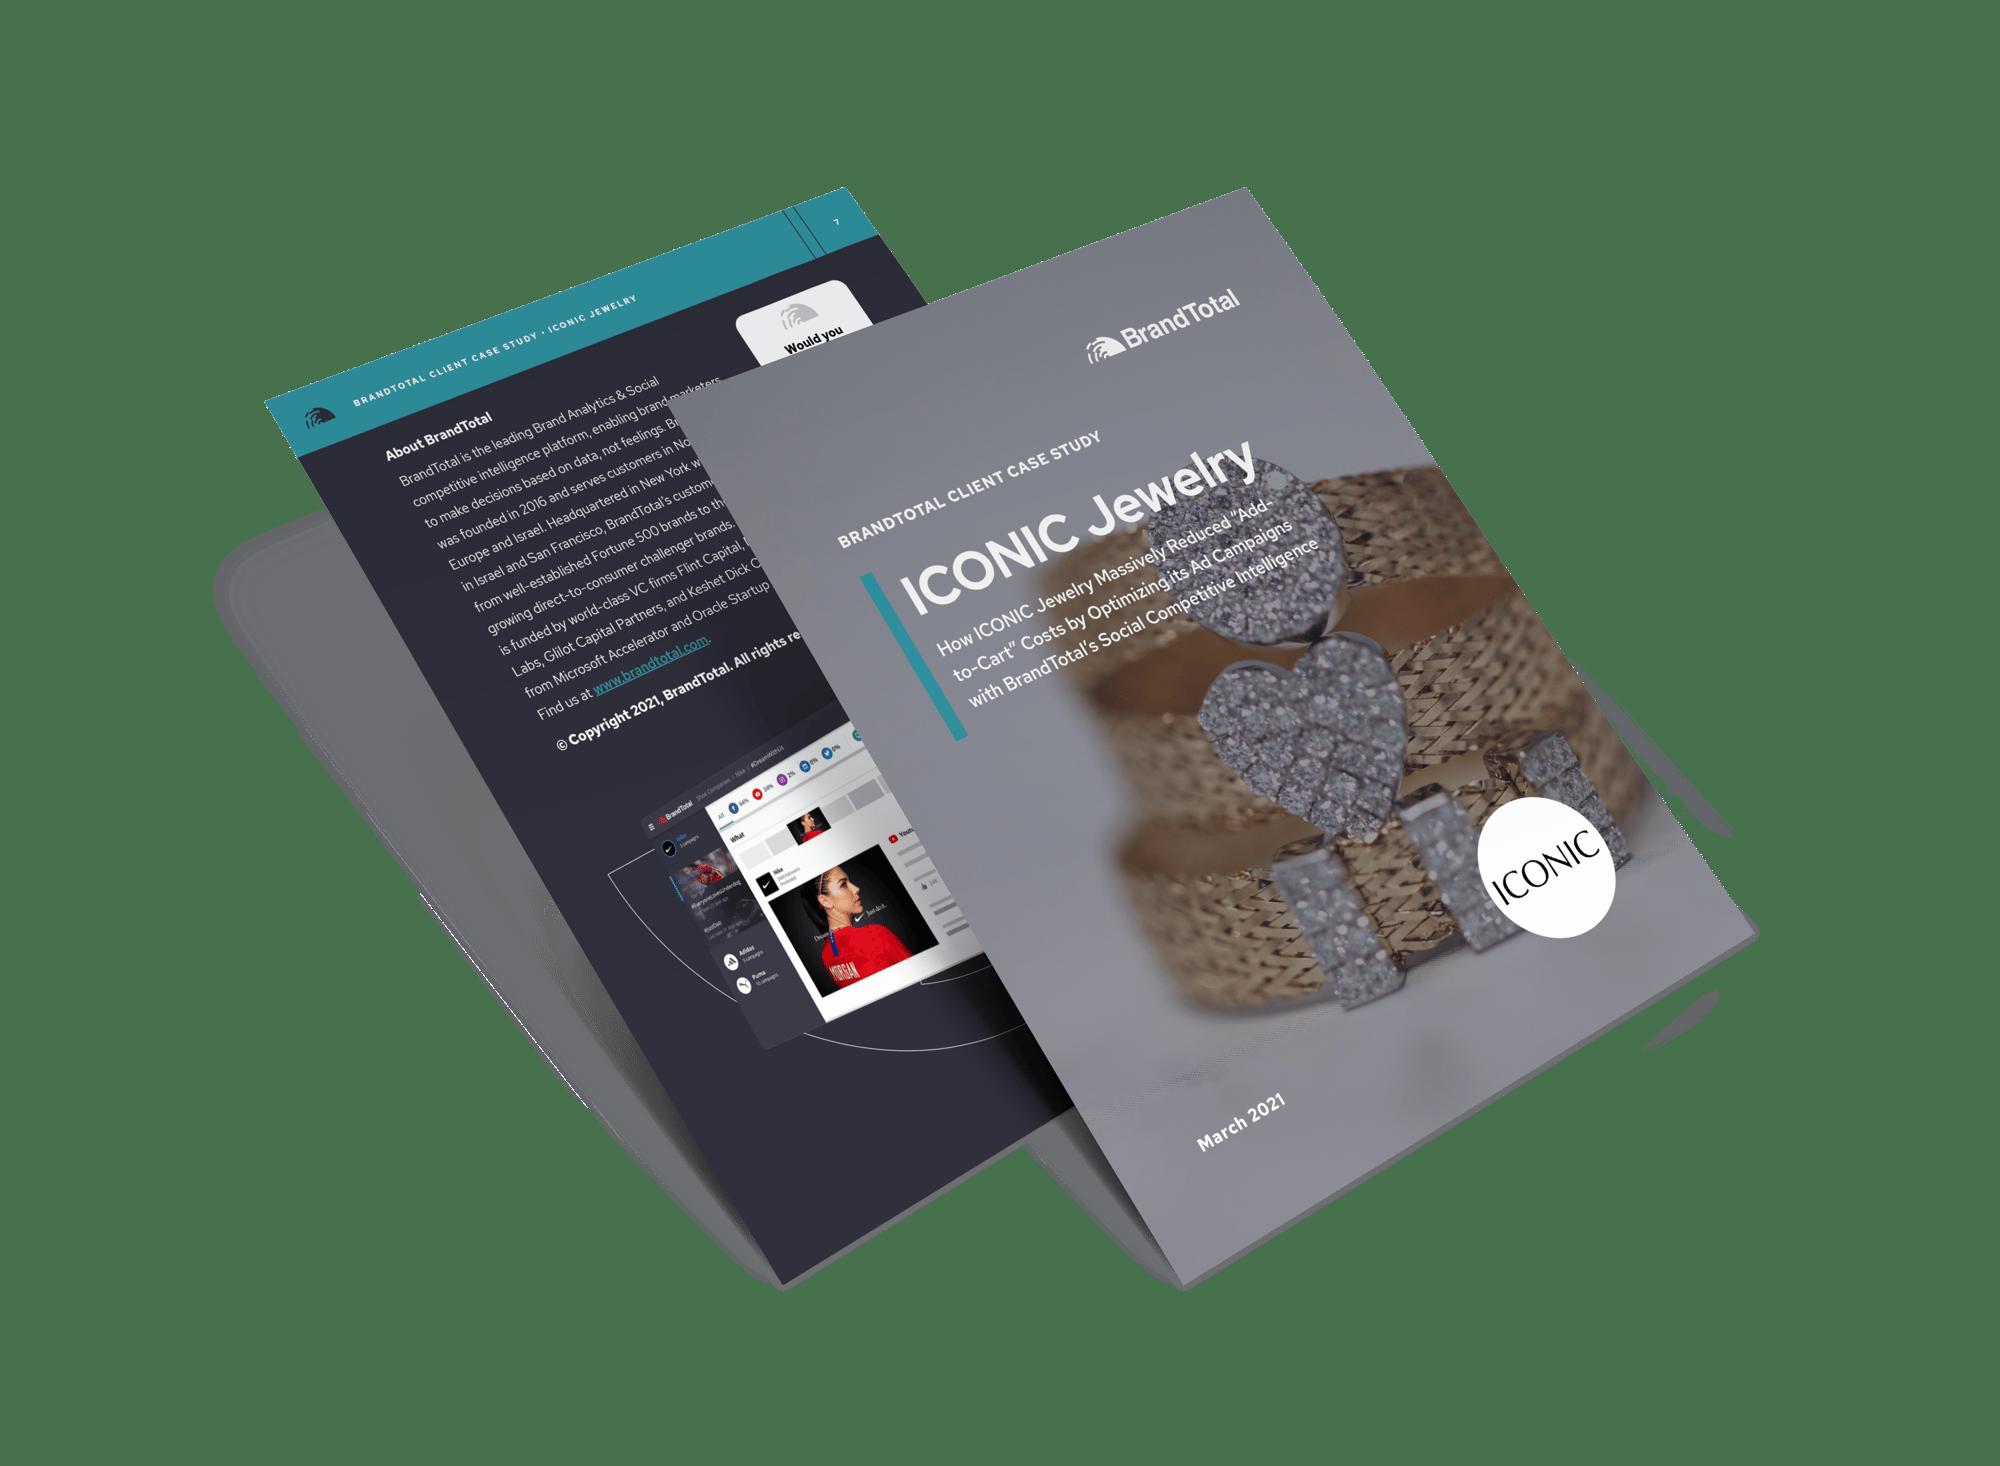 BrandTotal_Case-Study_ICONIC_mockup-image